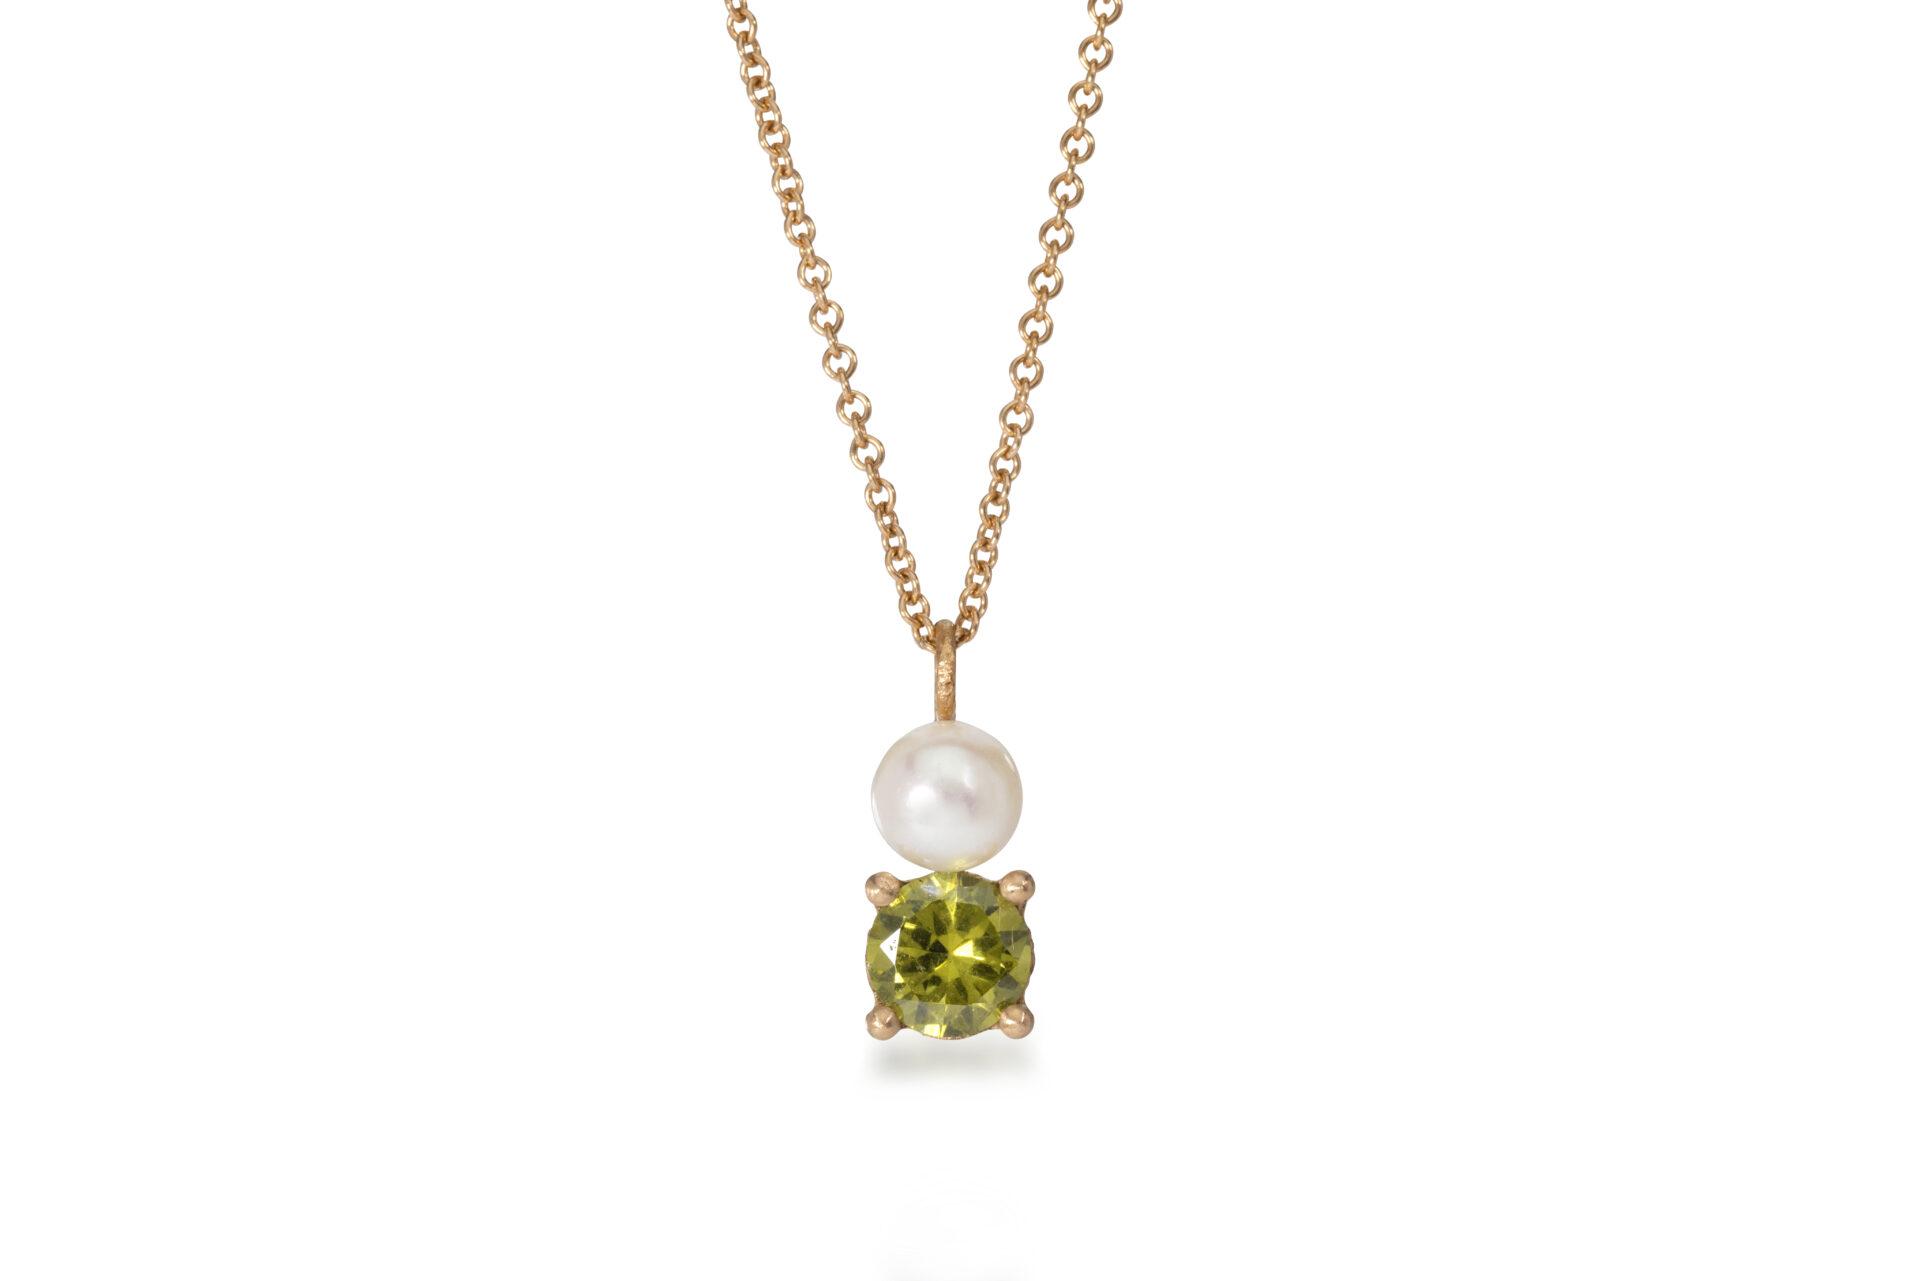 Emma's Peridot and Pearl Pendant